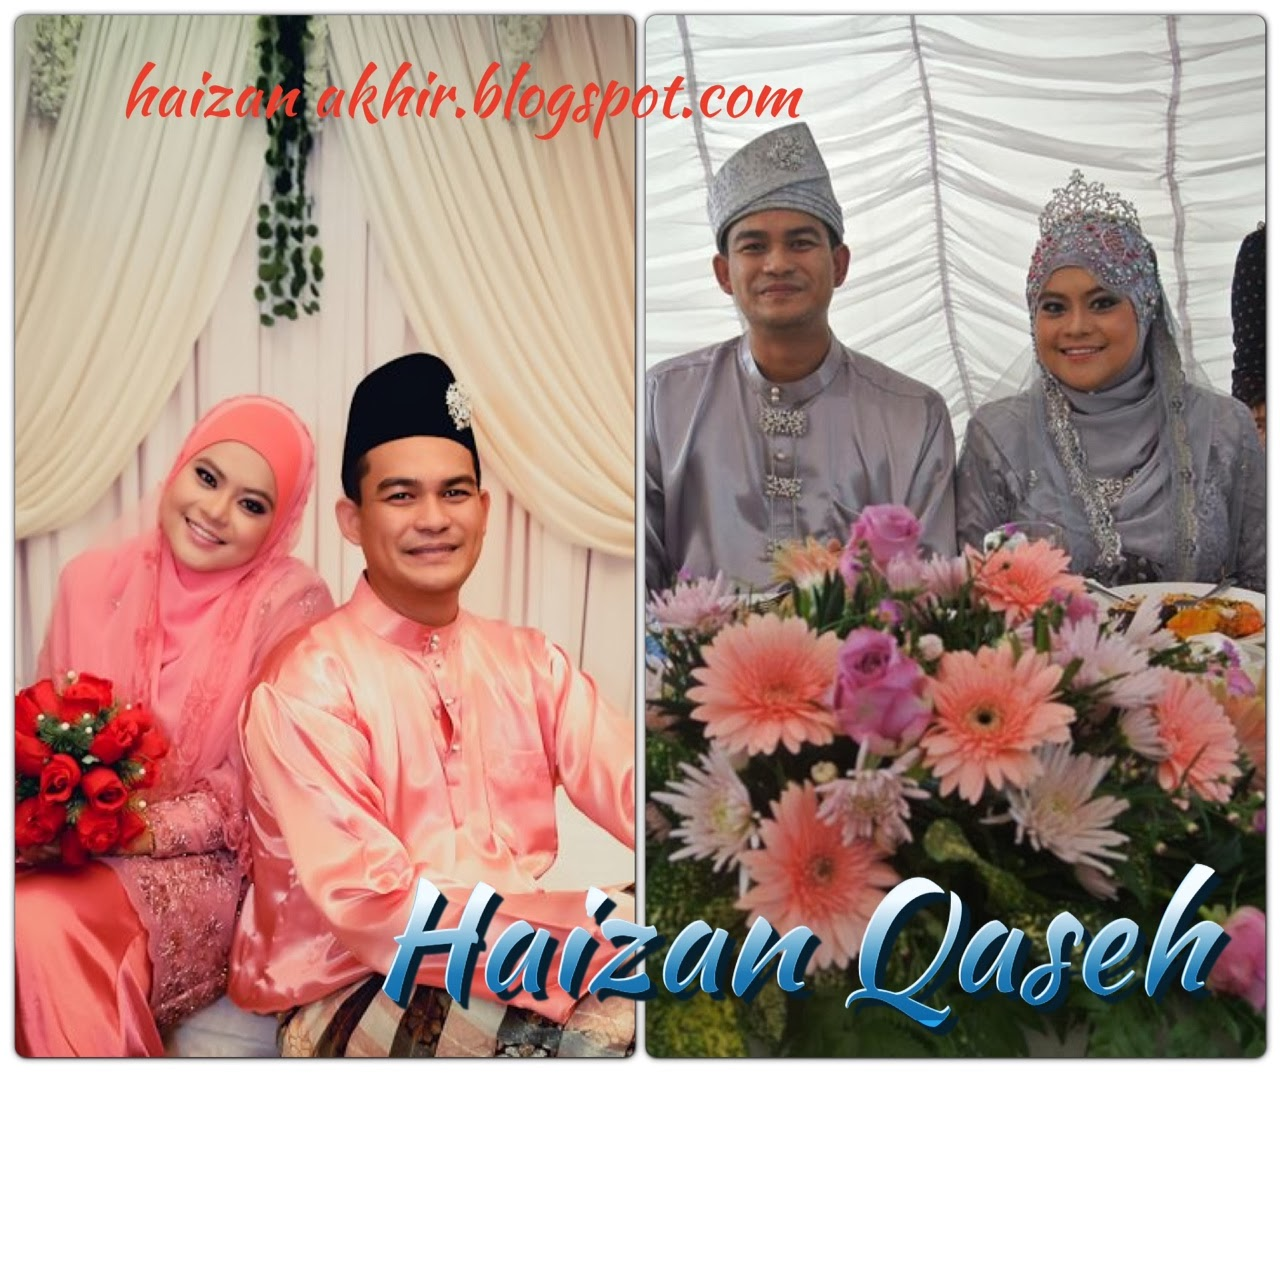 Haizan Qaseh